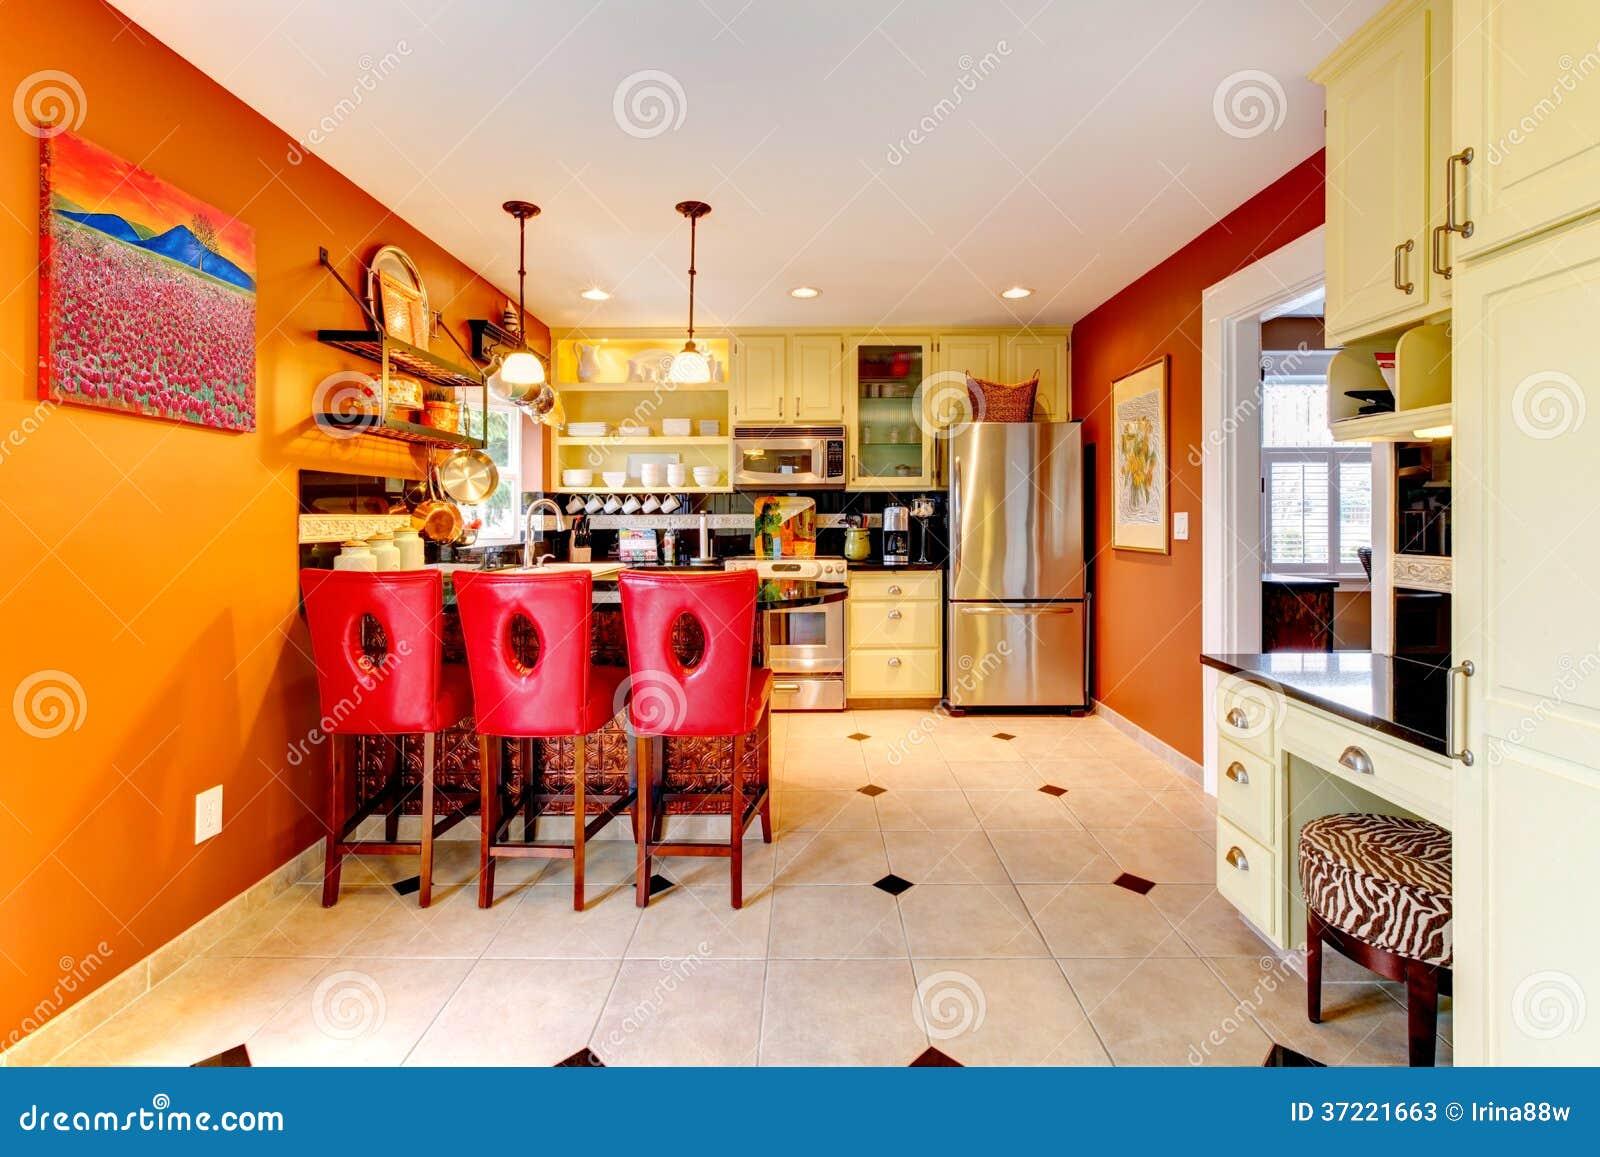 Warm Colors Cozy Kitchen Room Stock Photos Image 37221663